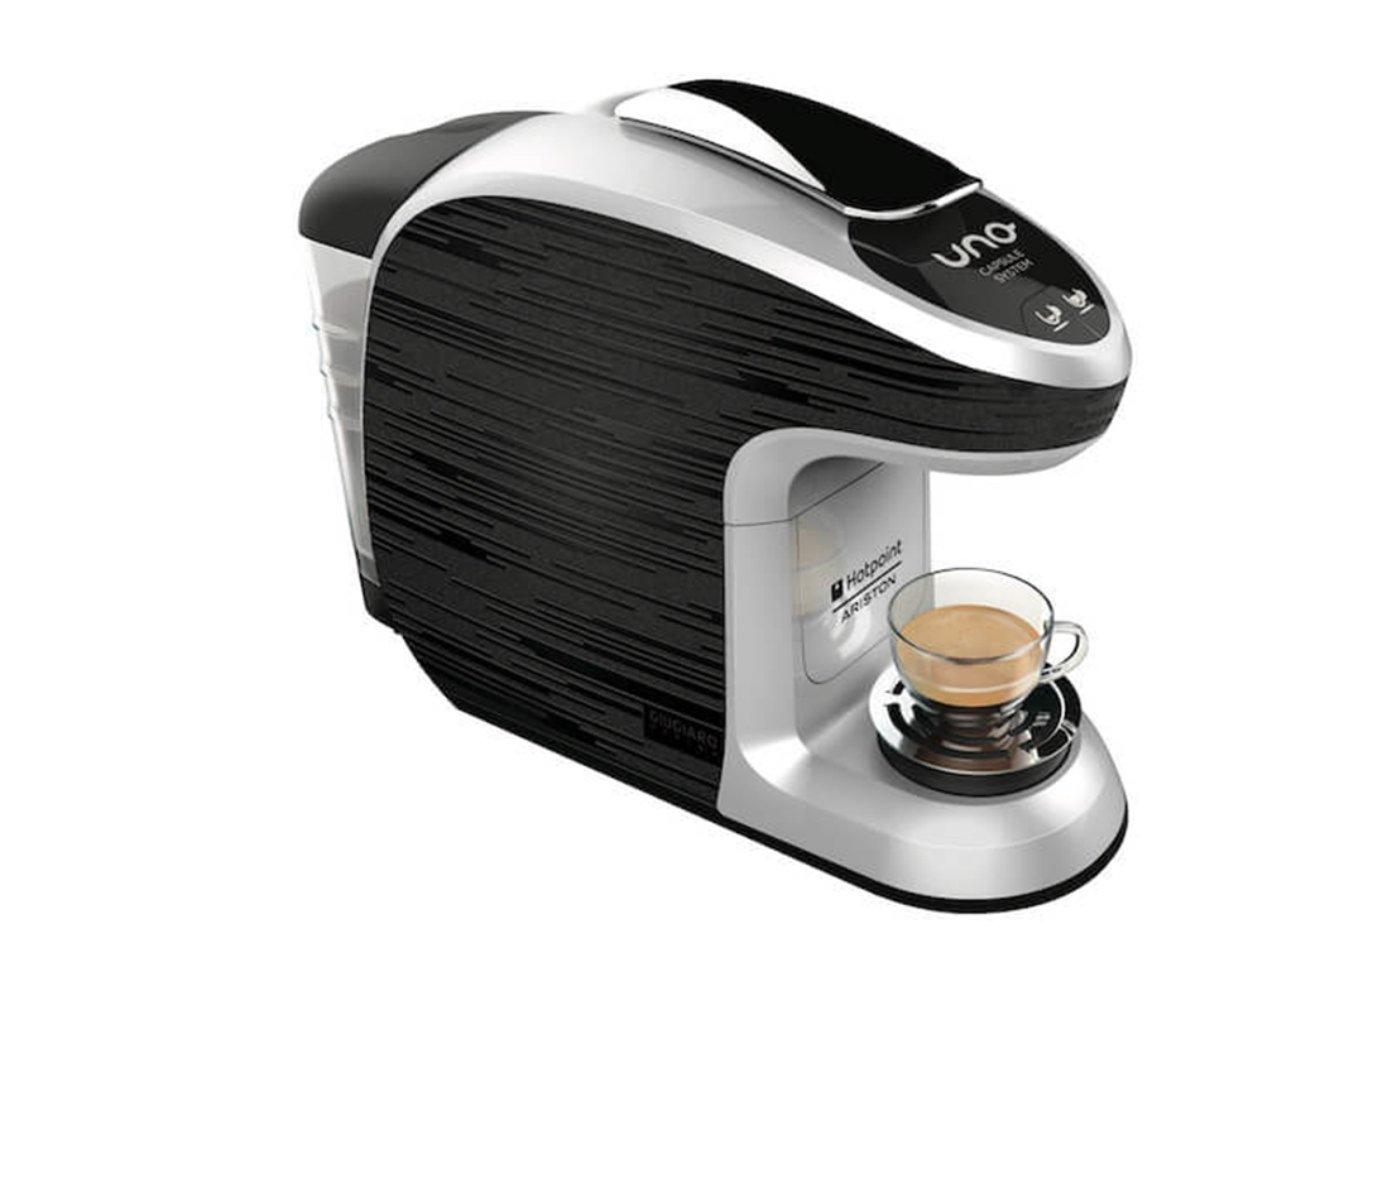 Macchina caffe' uno system Hotpoint Ariston piu' 100 capsule omaggio caffesicily